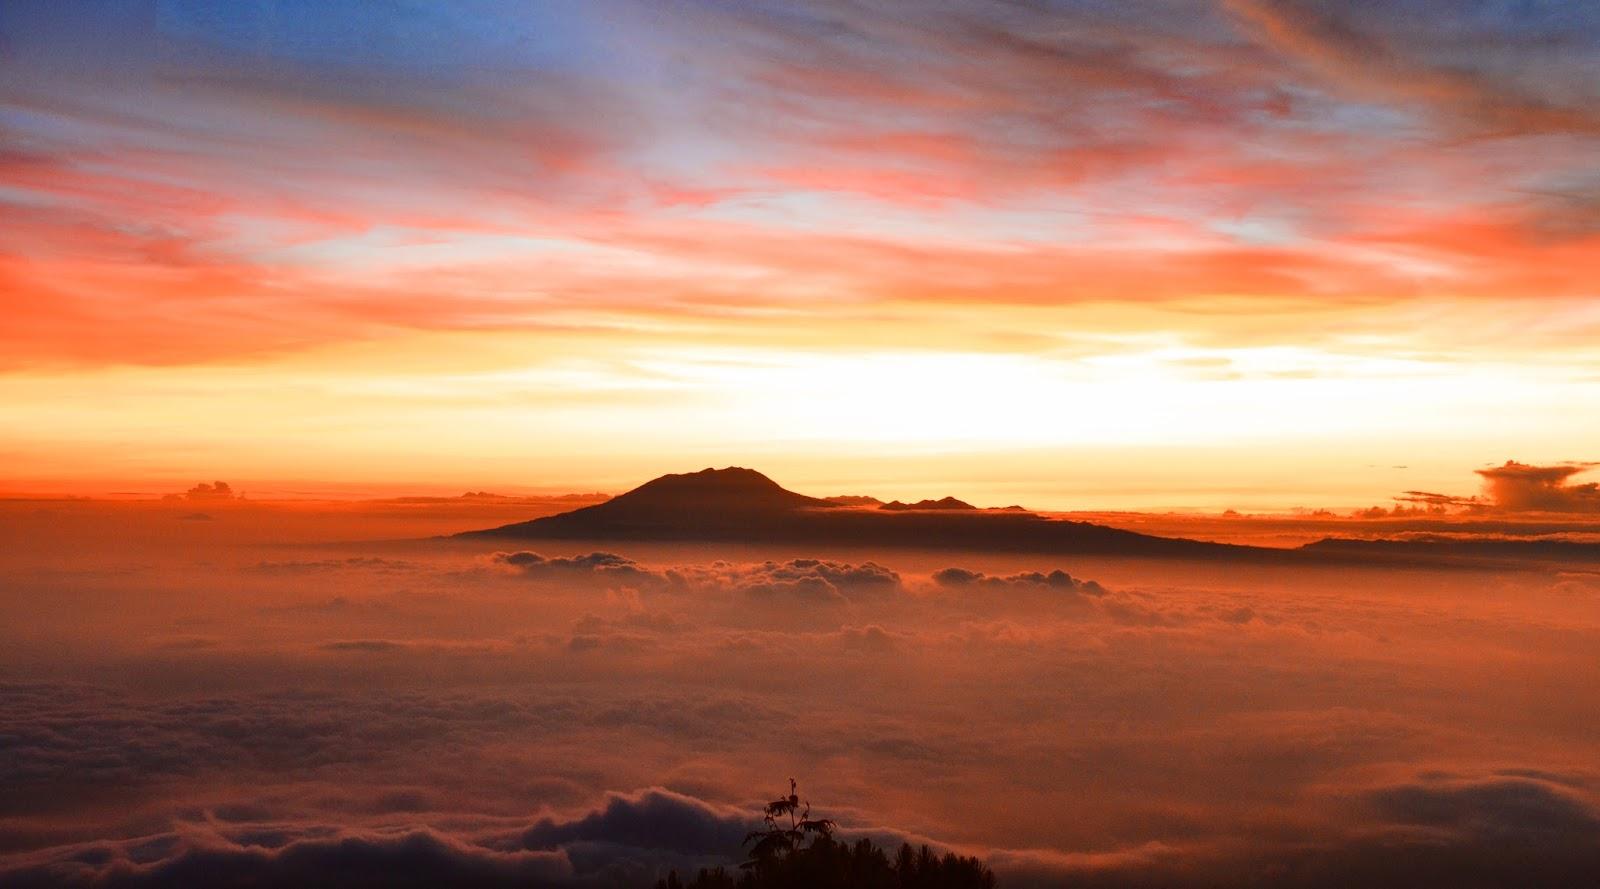 di balik gunung lawu gunung lawu erupsi terakhir gunung lawu erupsi bunga edelweis gunung lawu